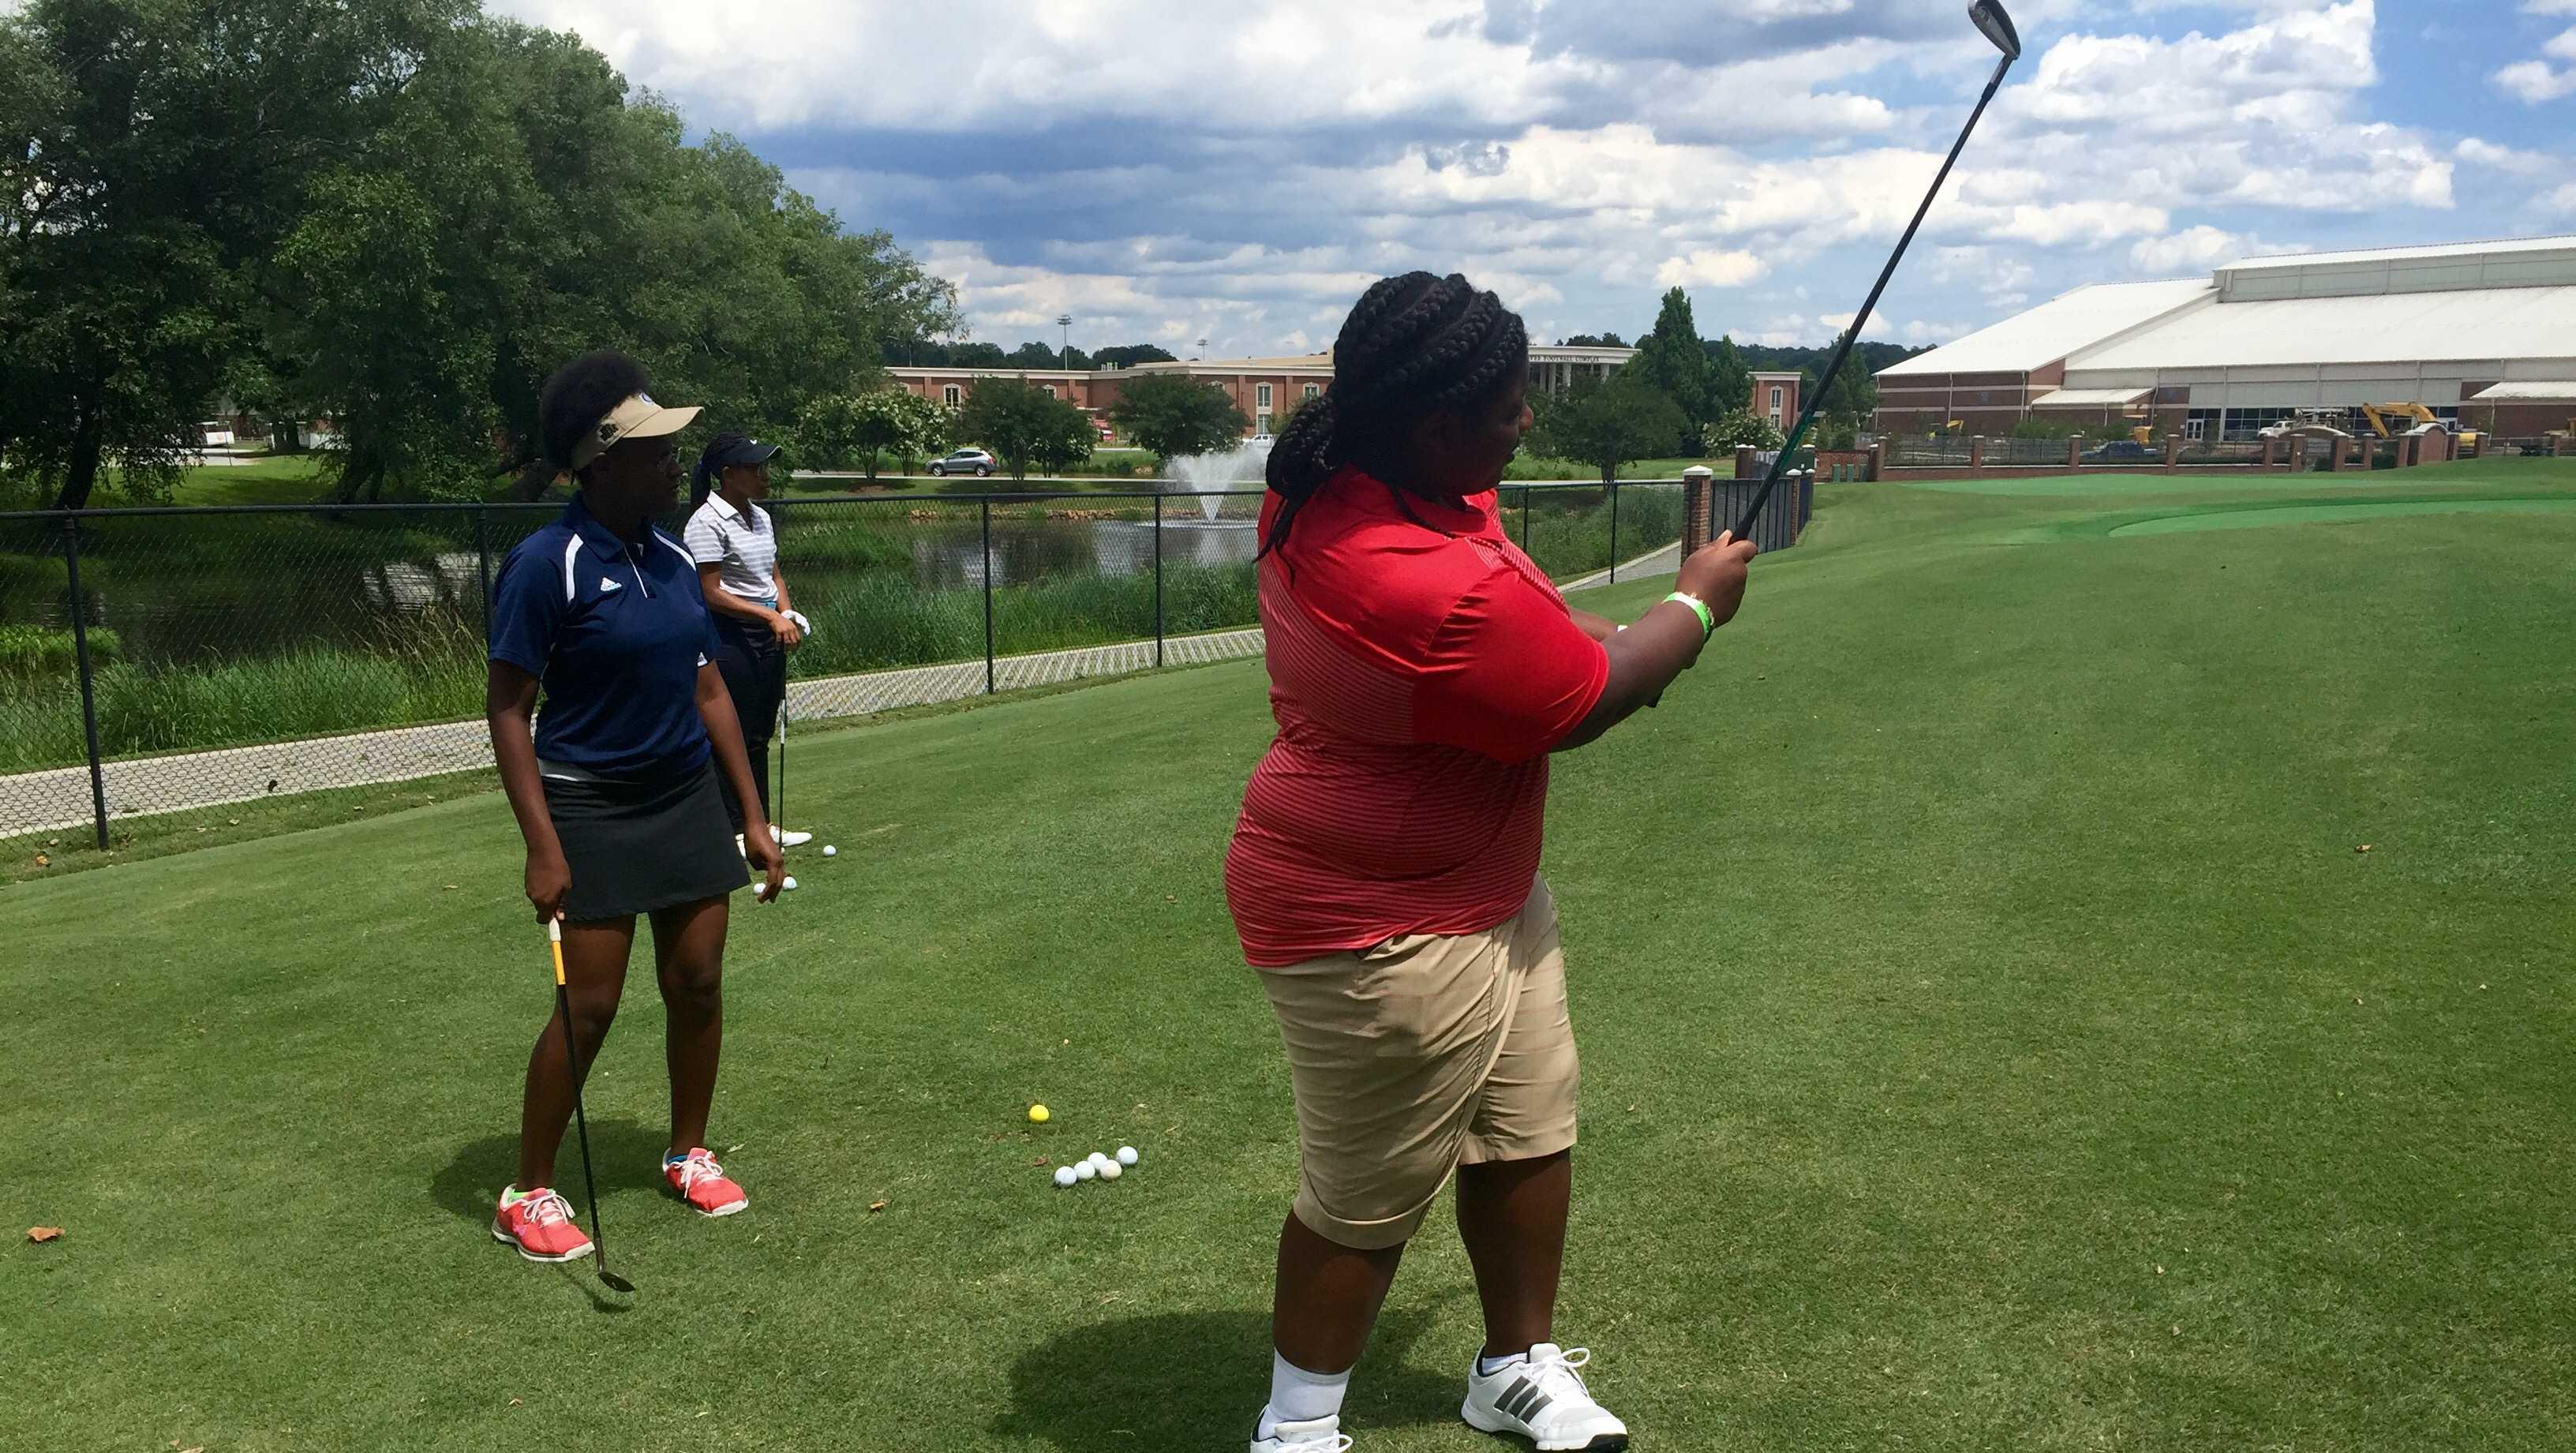 Clemson's Diversity Golf Camp